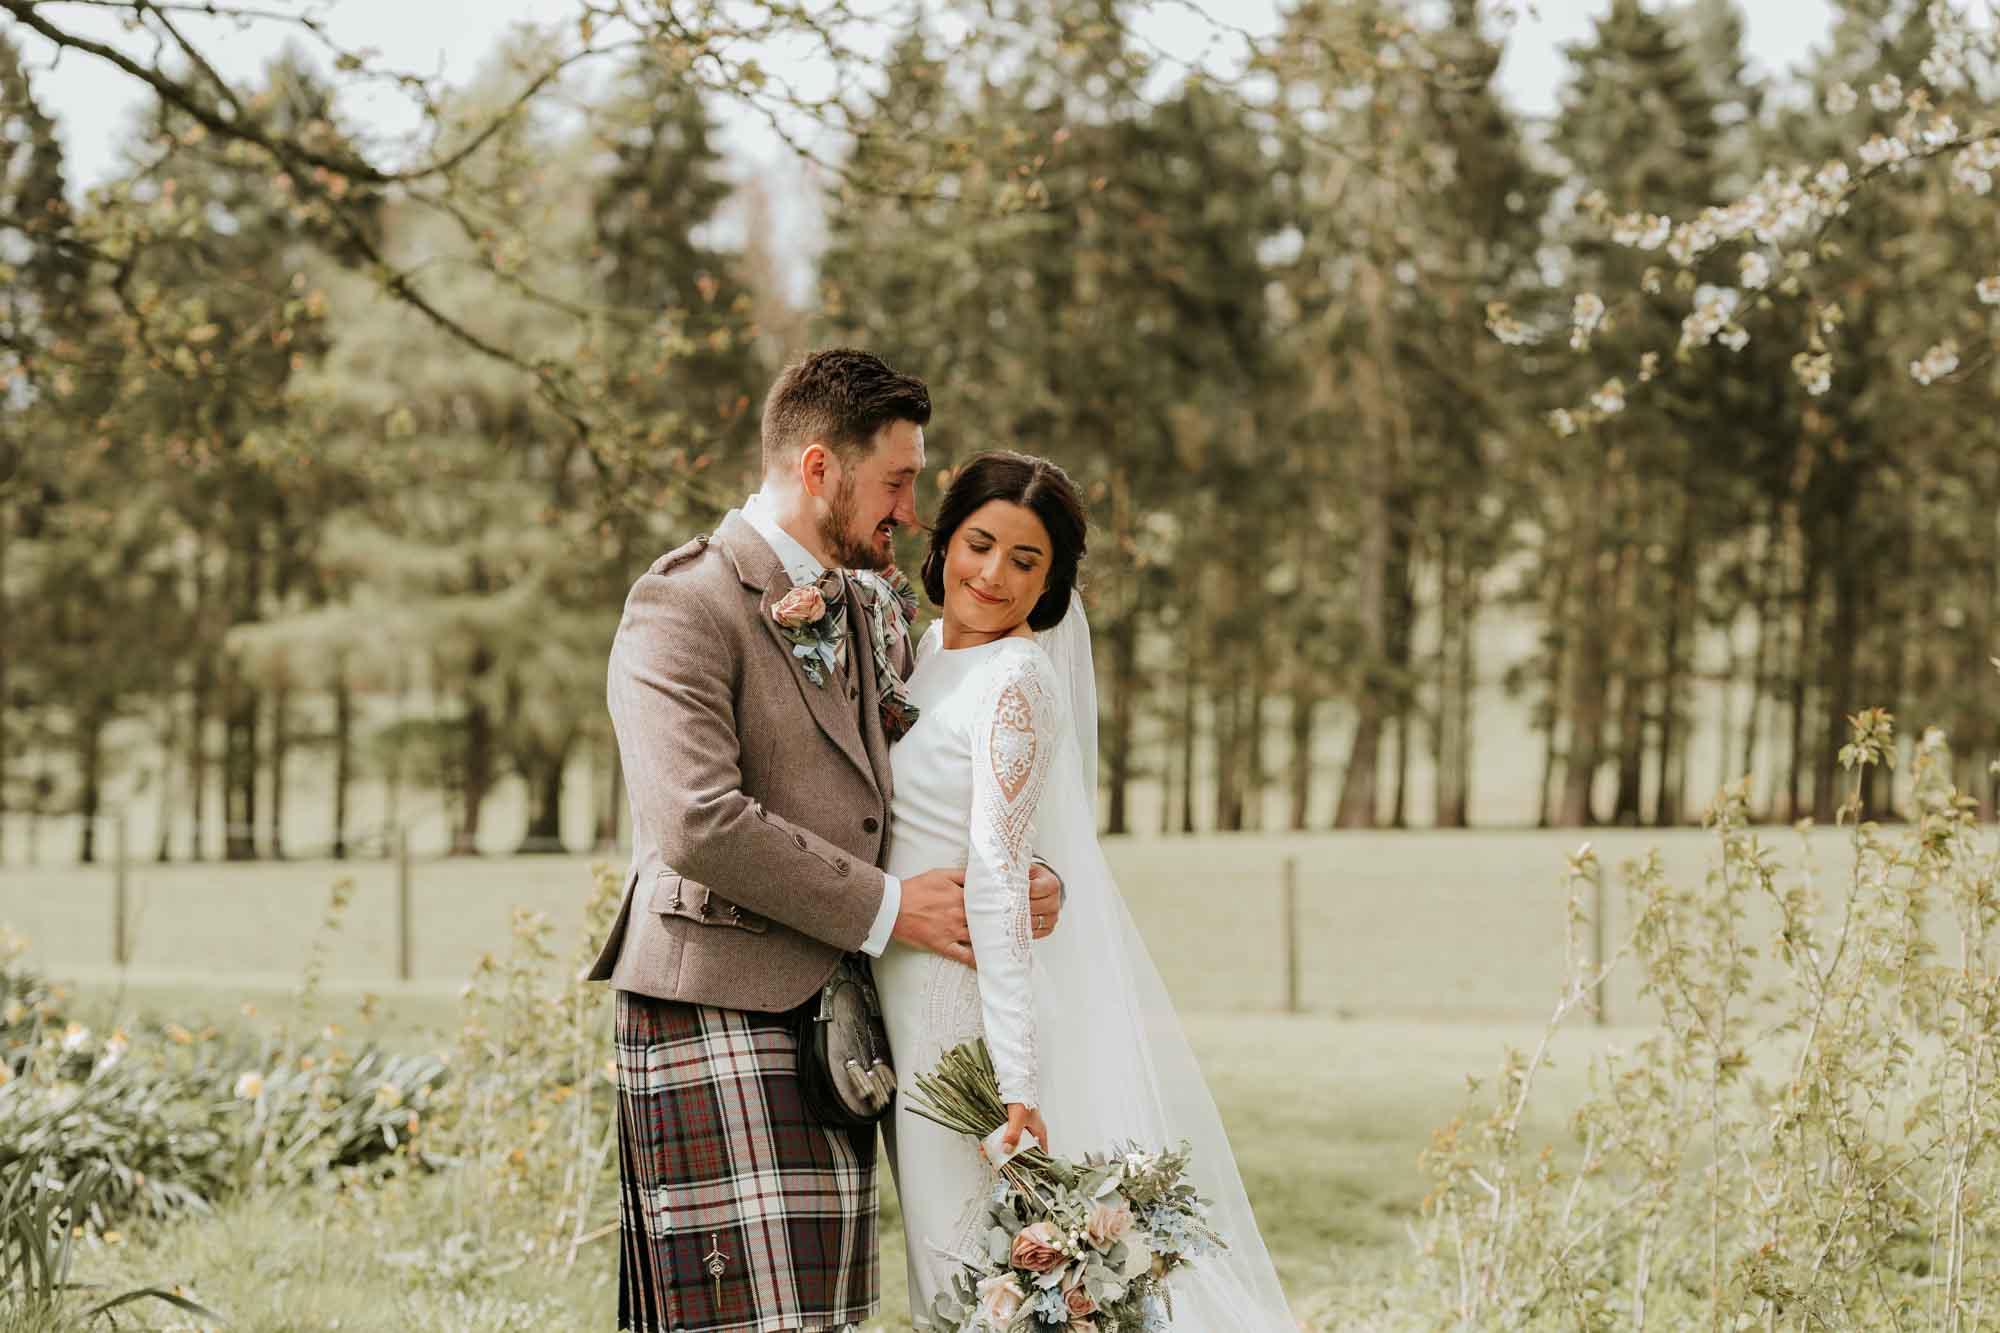 Cornhill Castle Wedding Blog -34